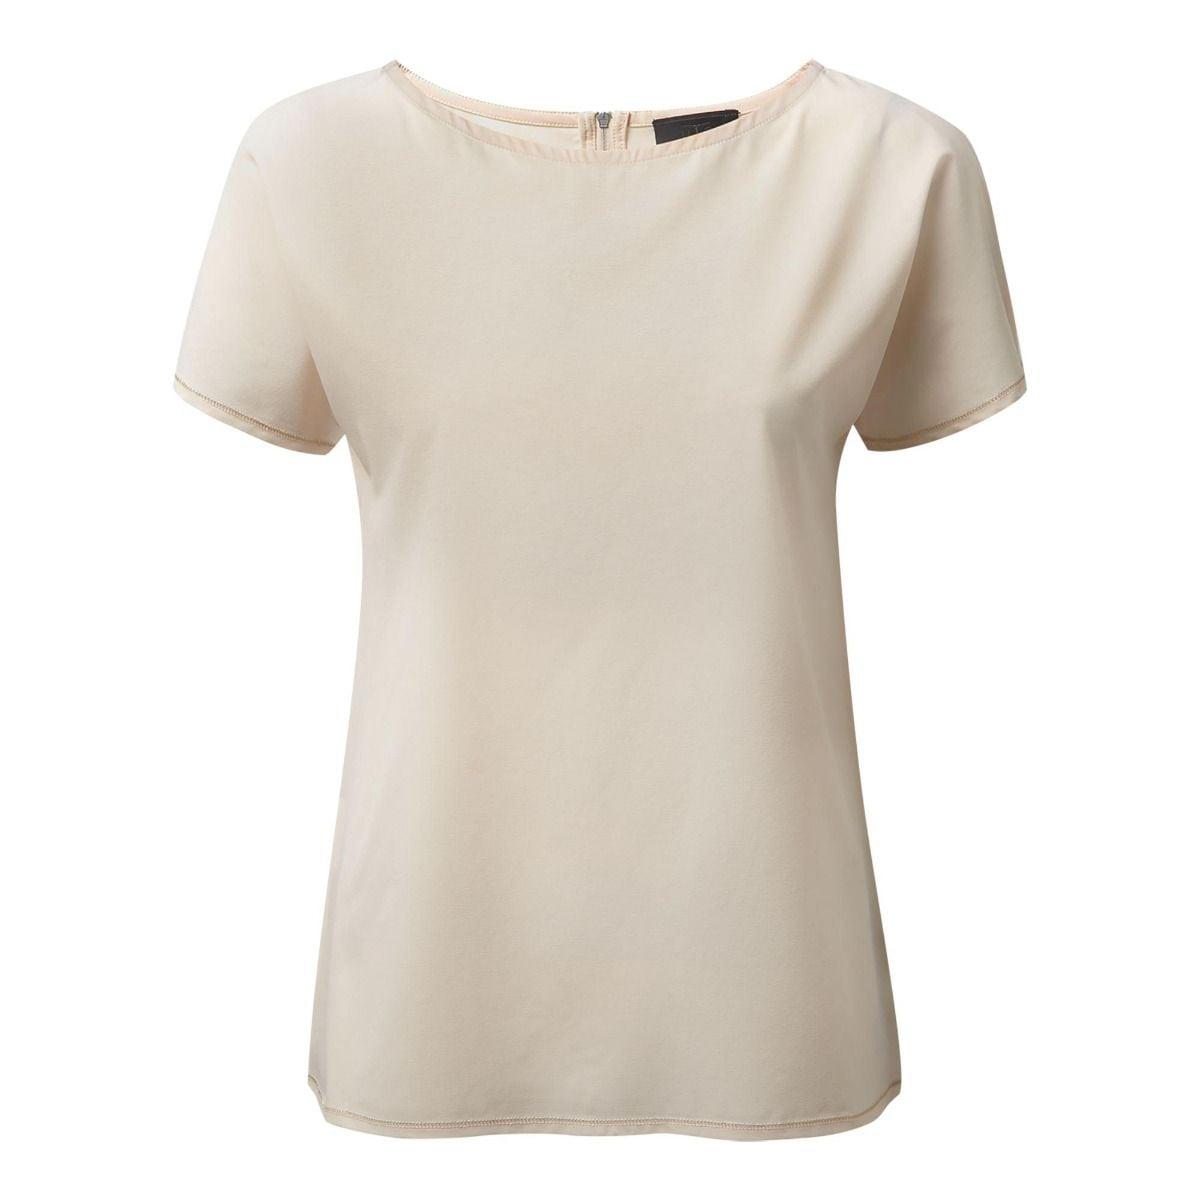 Craghoppers T-Shirt NosiLife Damen Top Carmel kurzärmlig